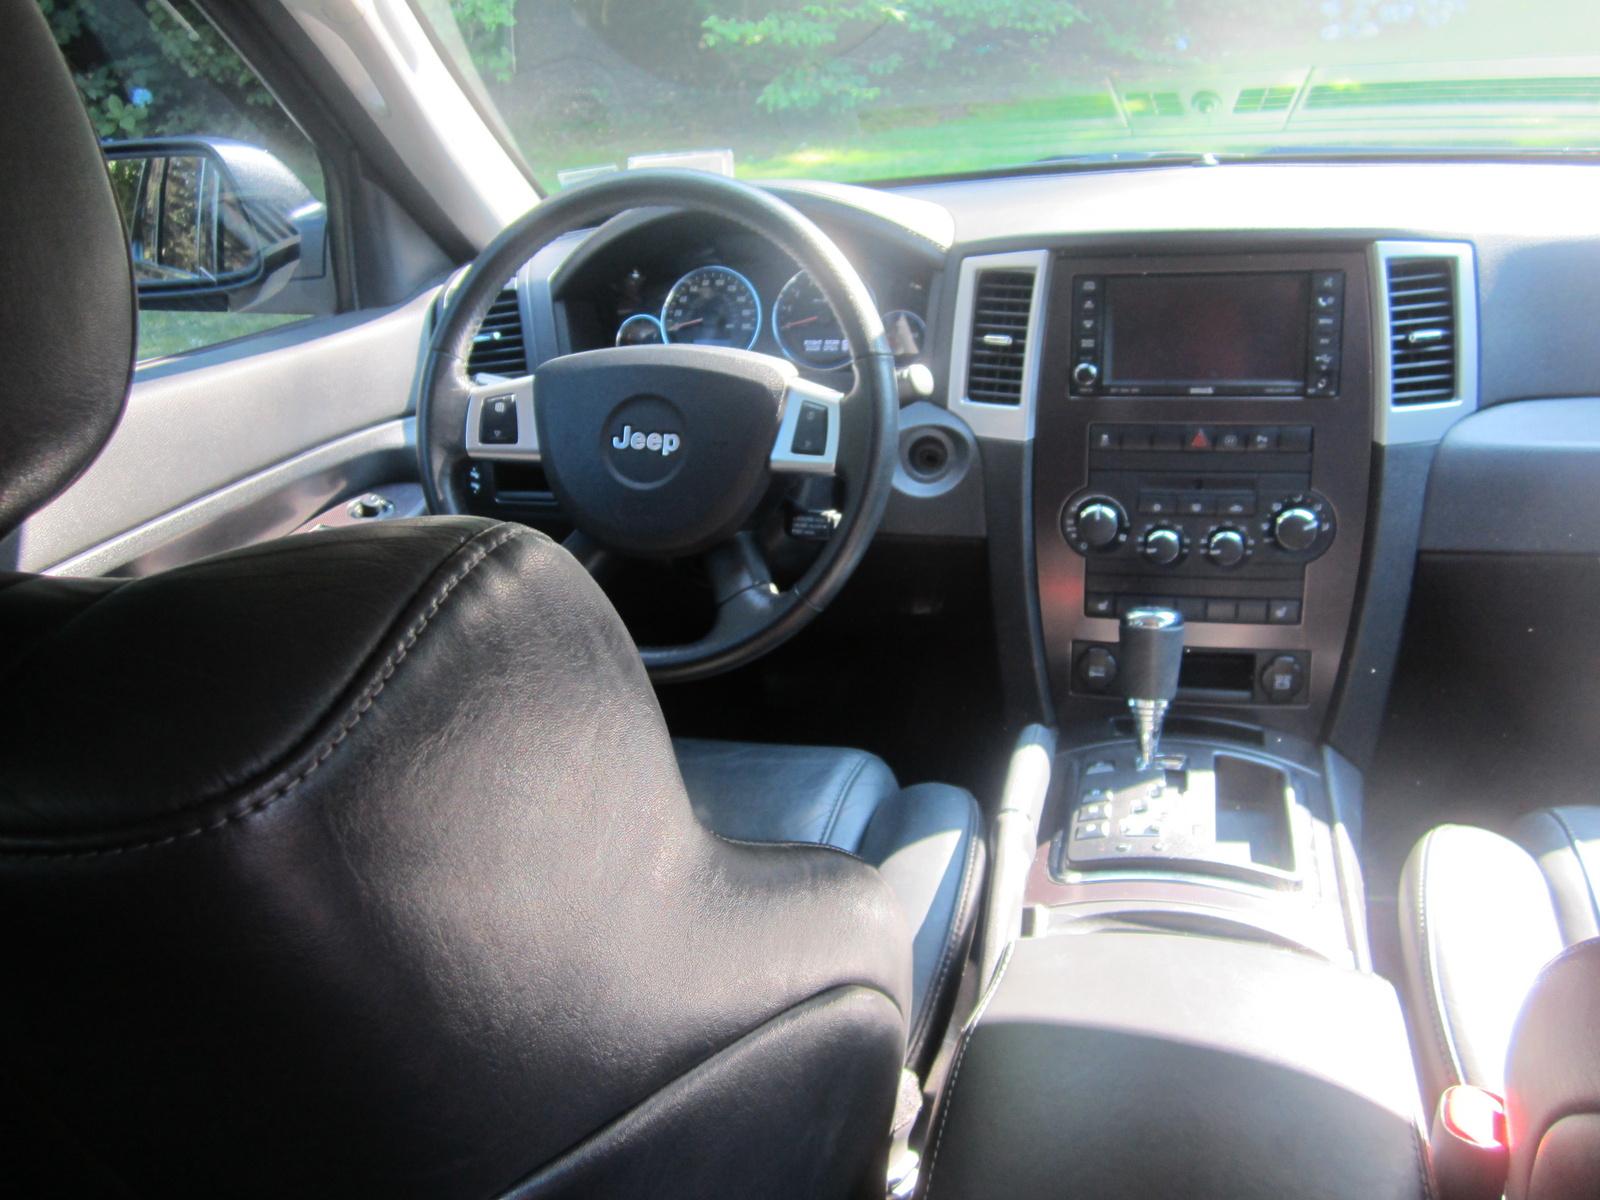 2010 Jeep Grand Cherokee CarGurus